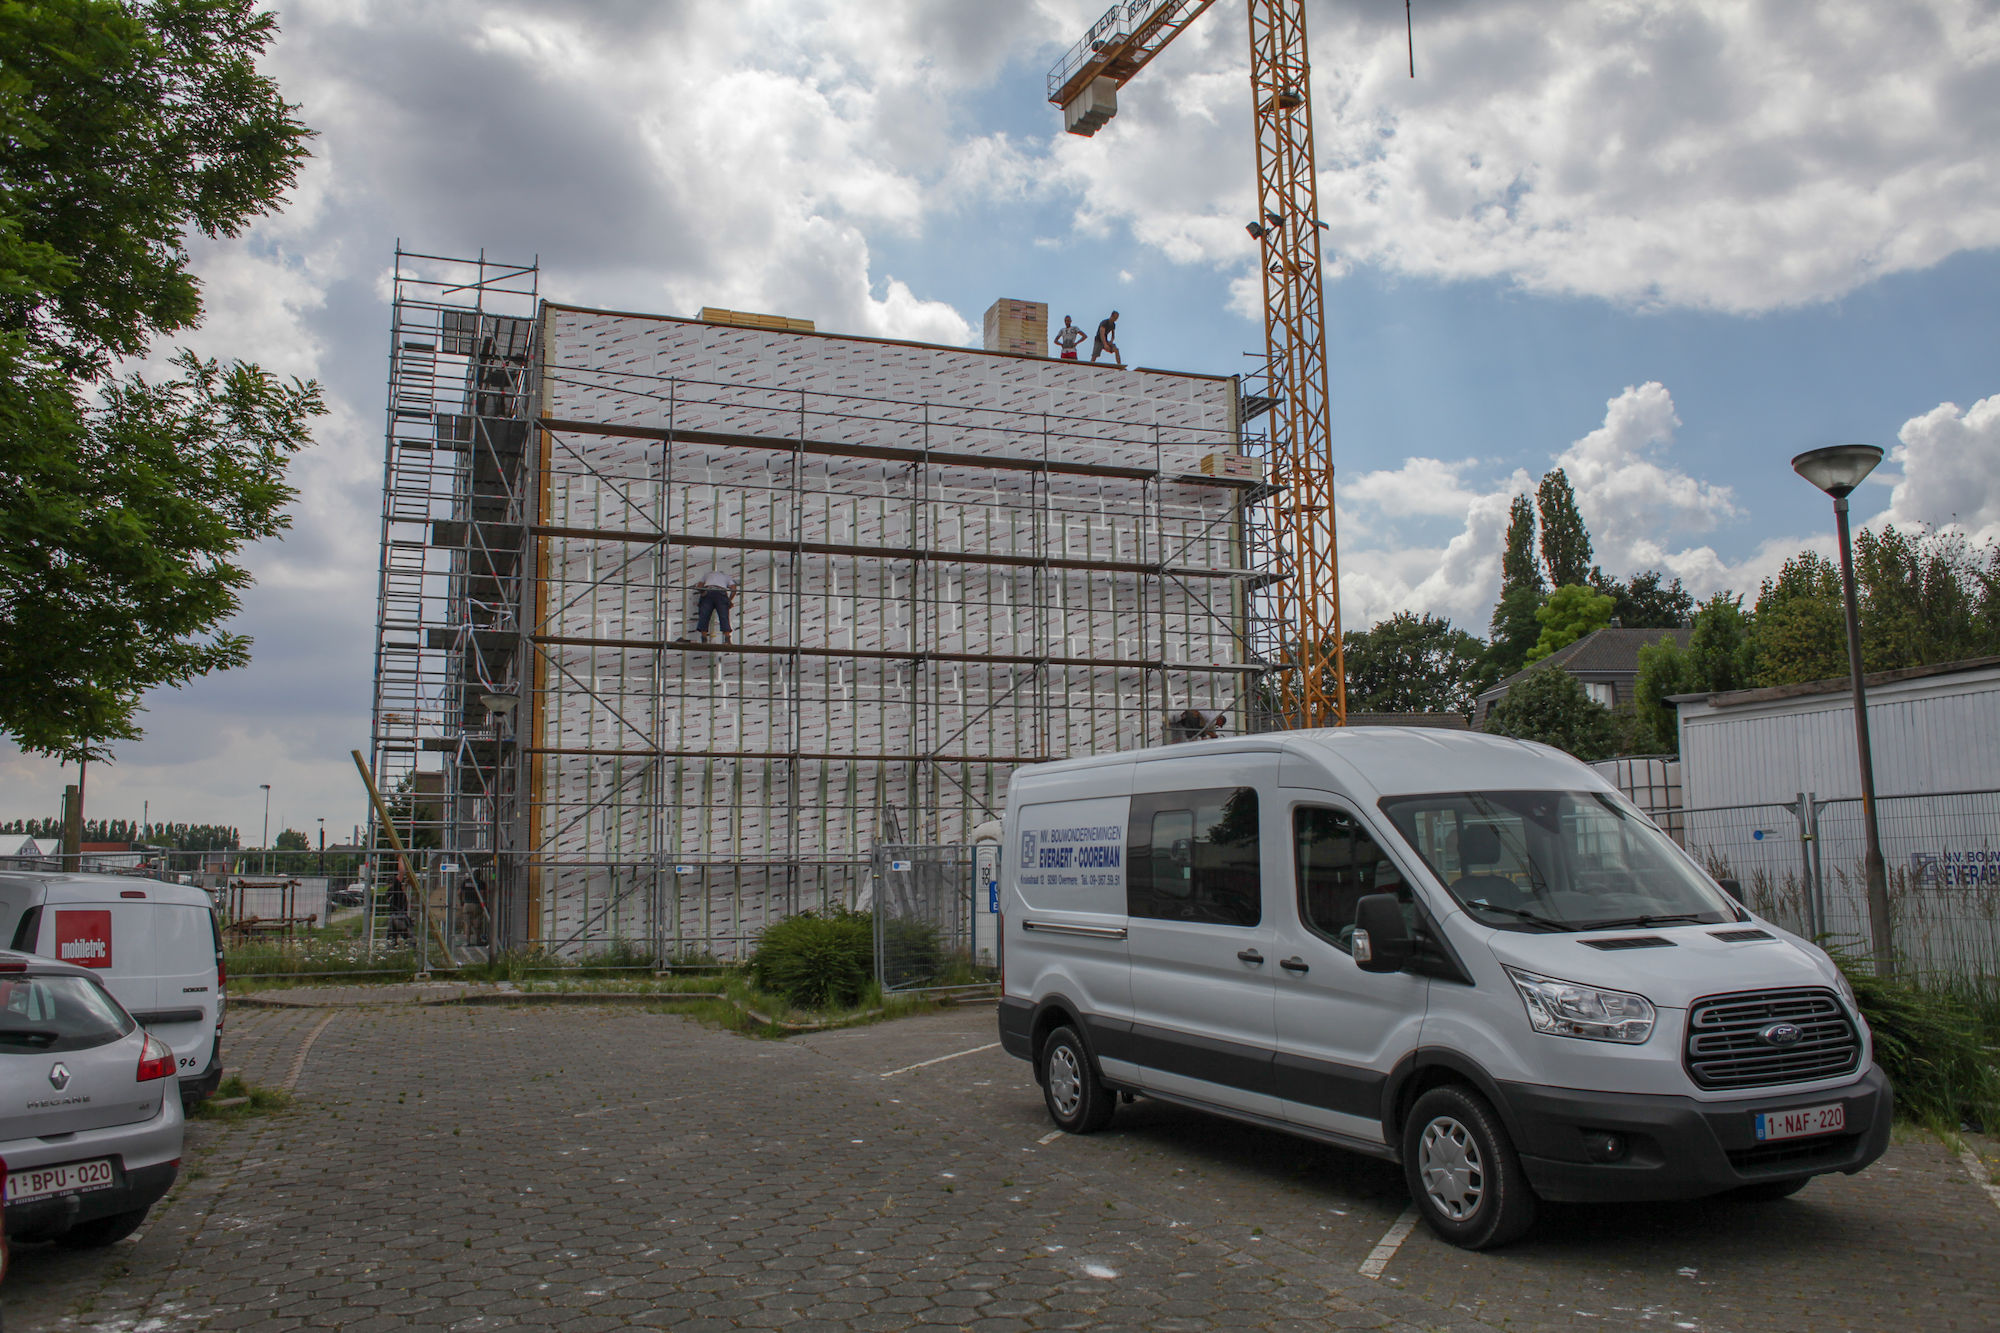 2019-07-02 Muide Meulestede prospectie Wannes_stadsvernieuwing_IMG_0322-2.jpg